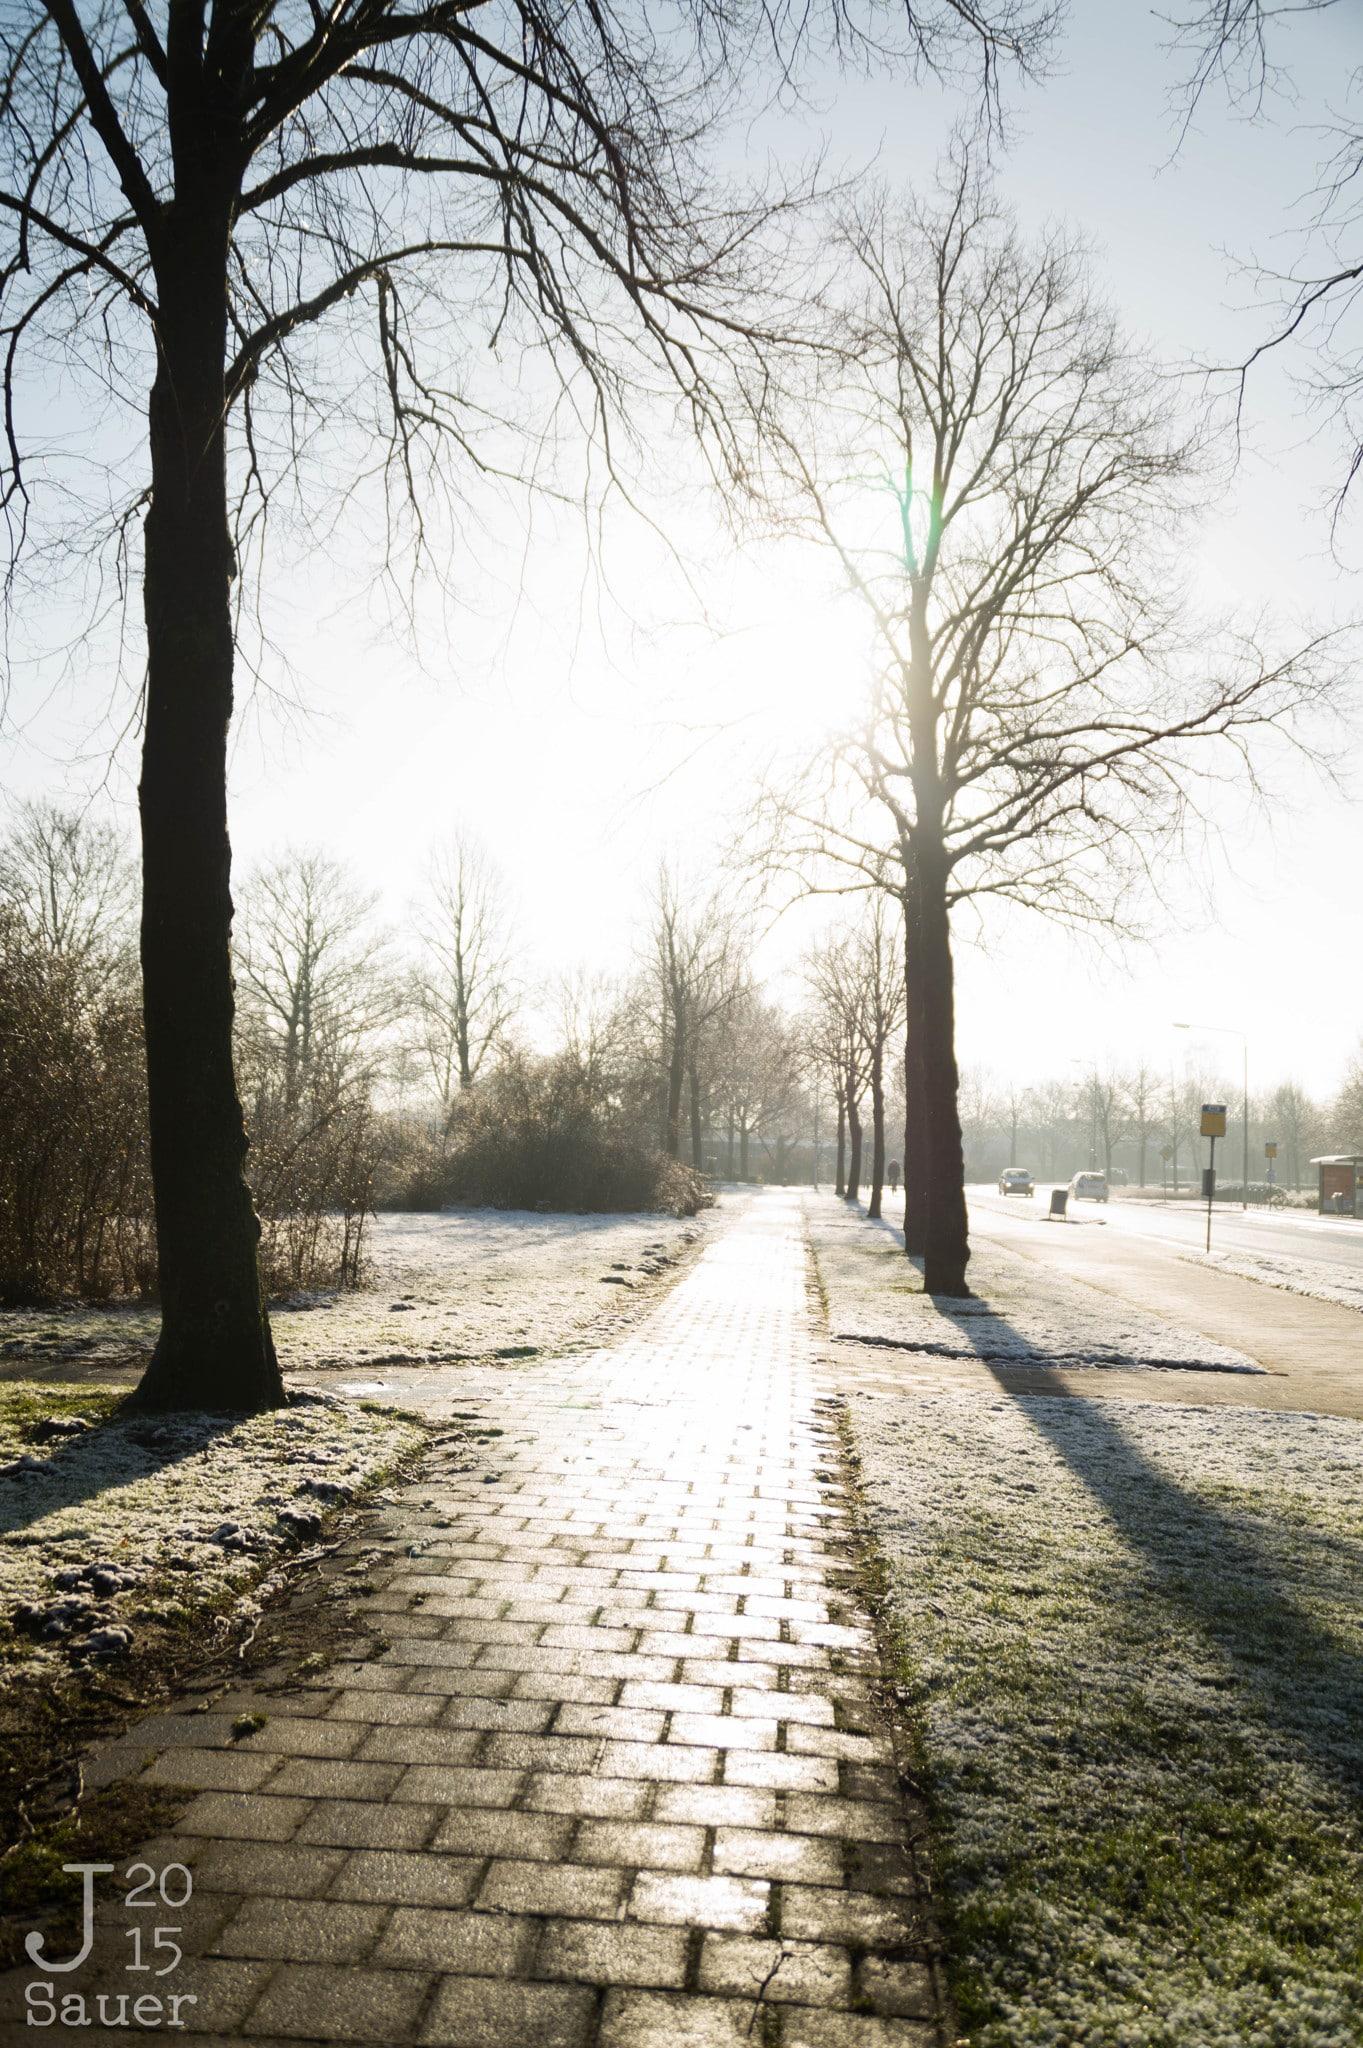 Winter sun reflects on the street